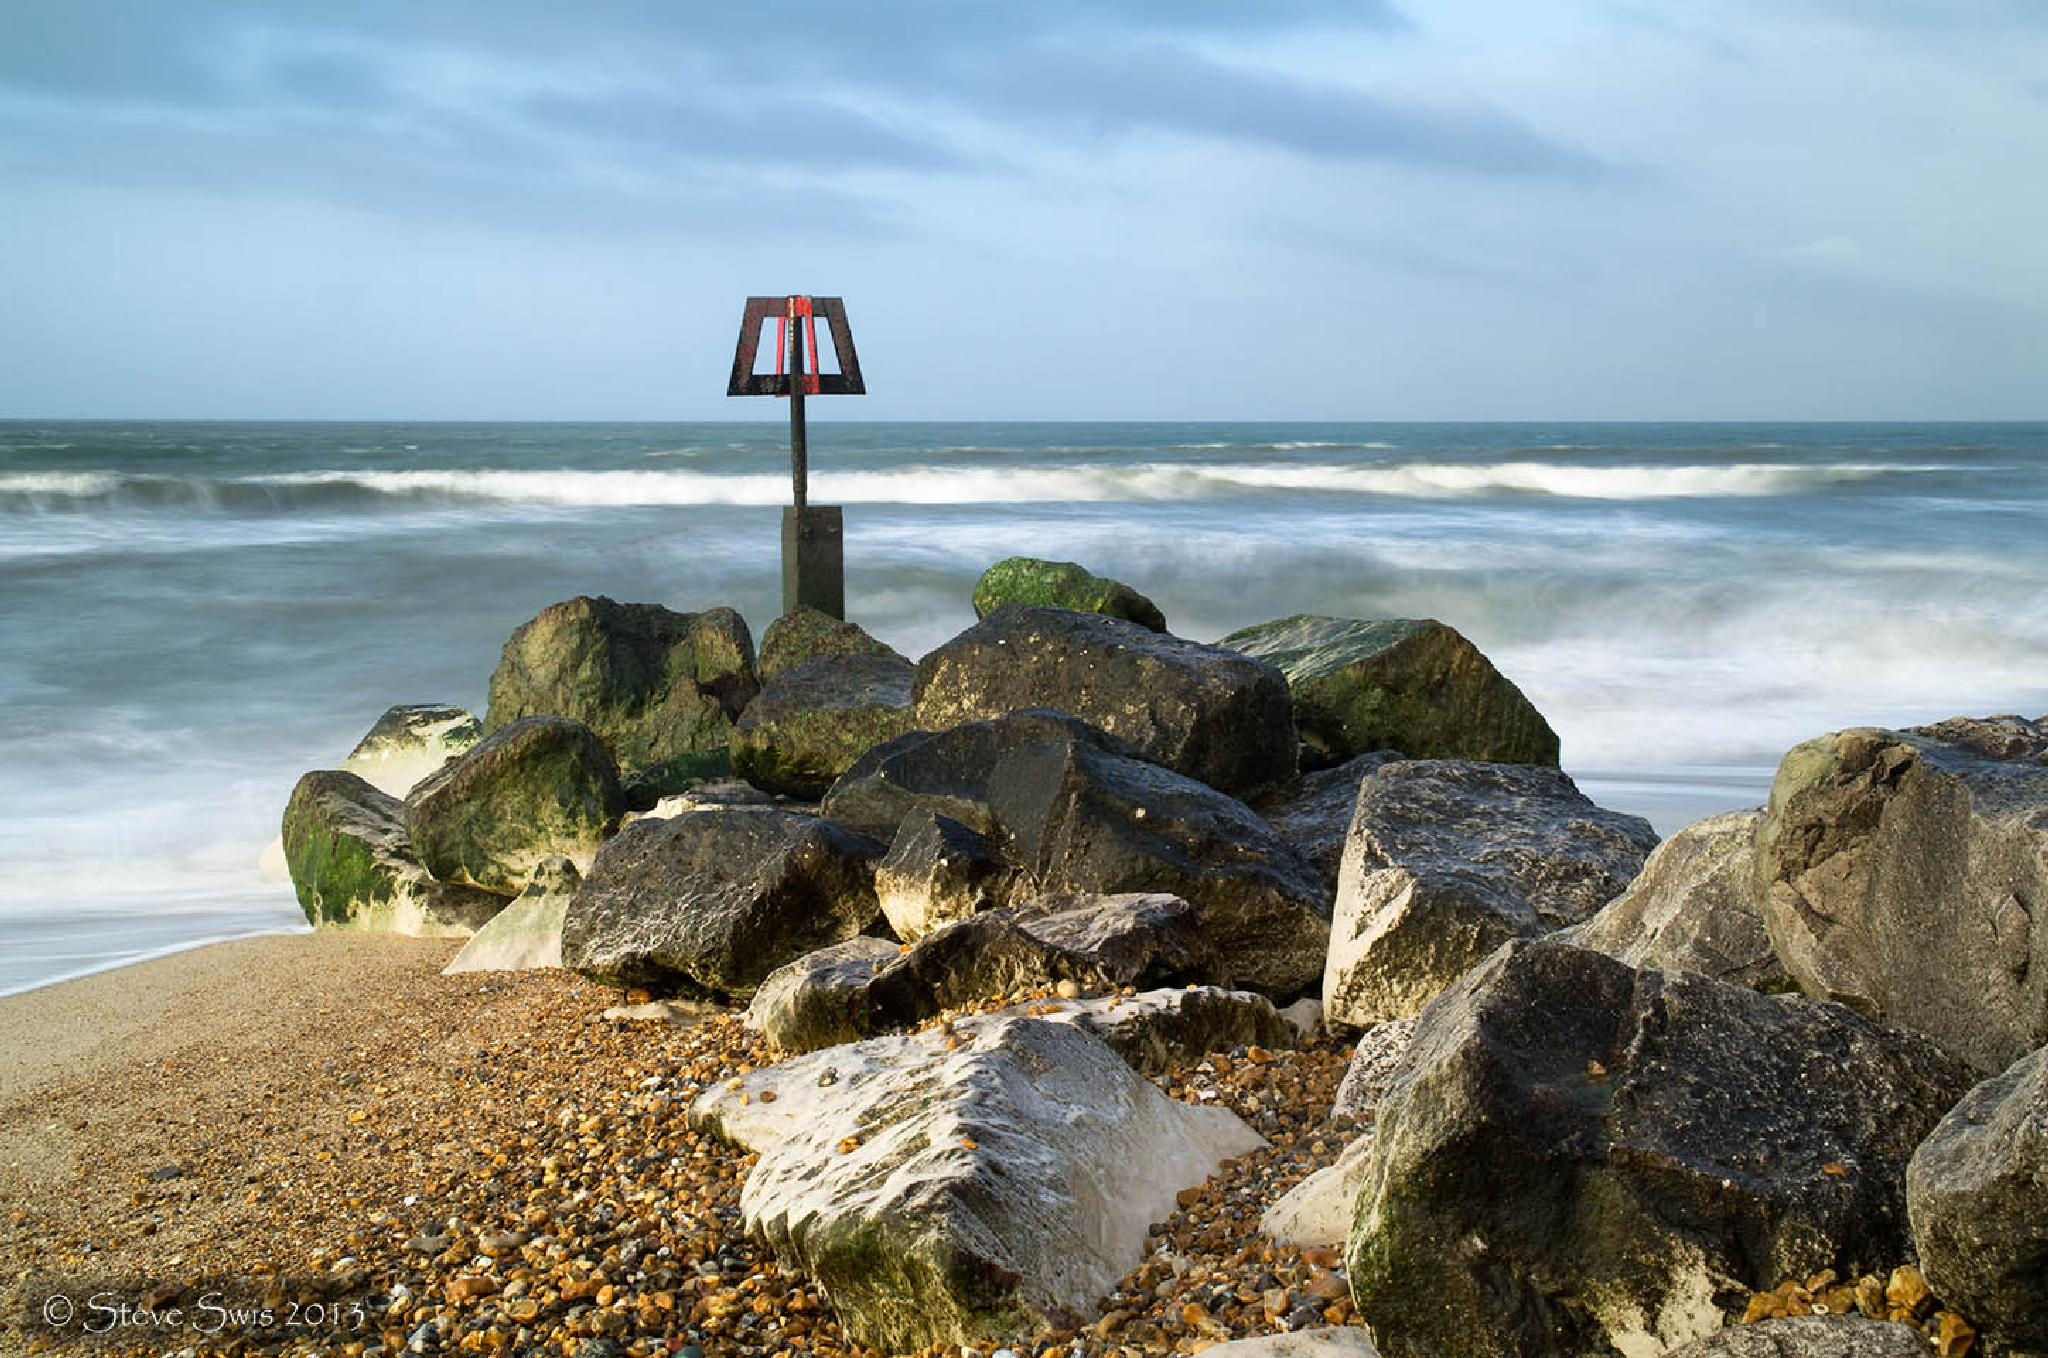 water and rocks by Steve Swis